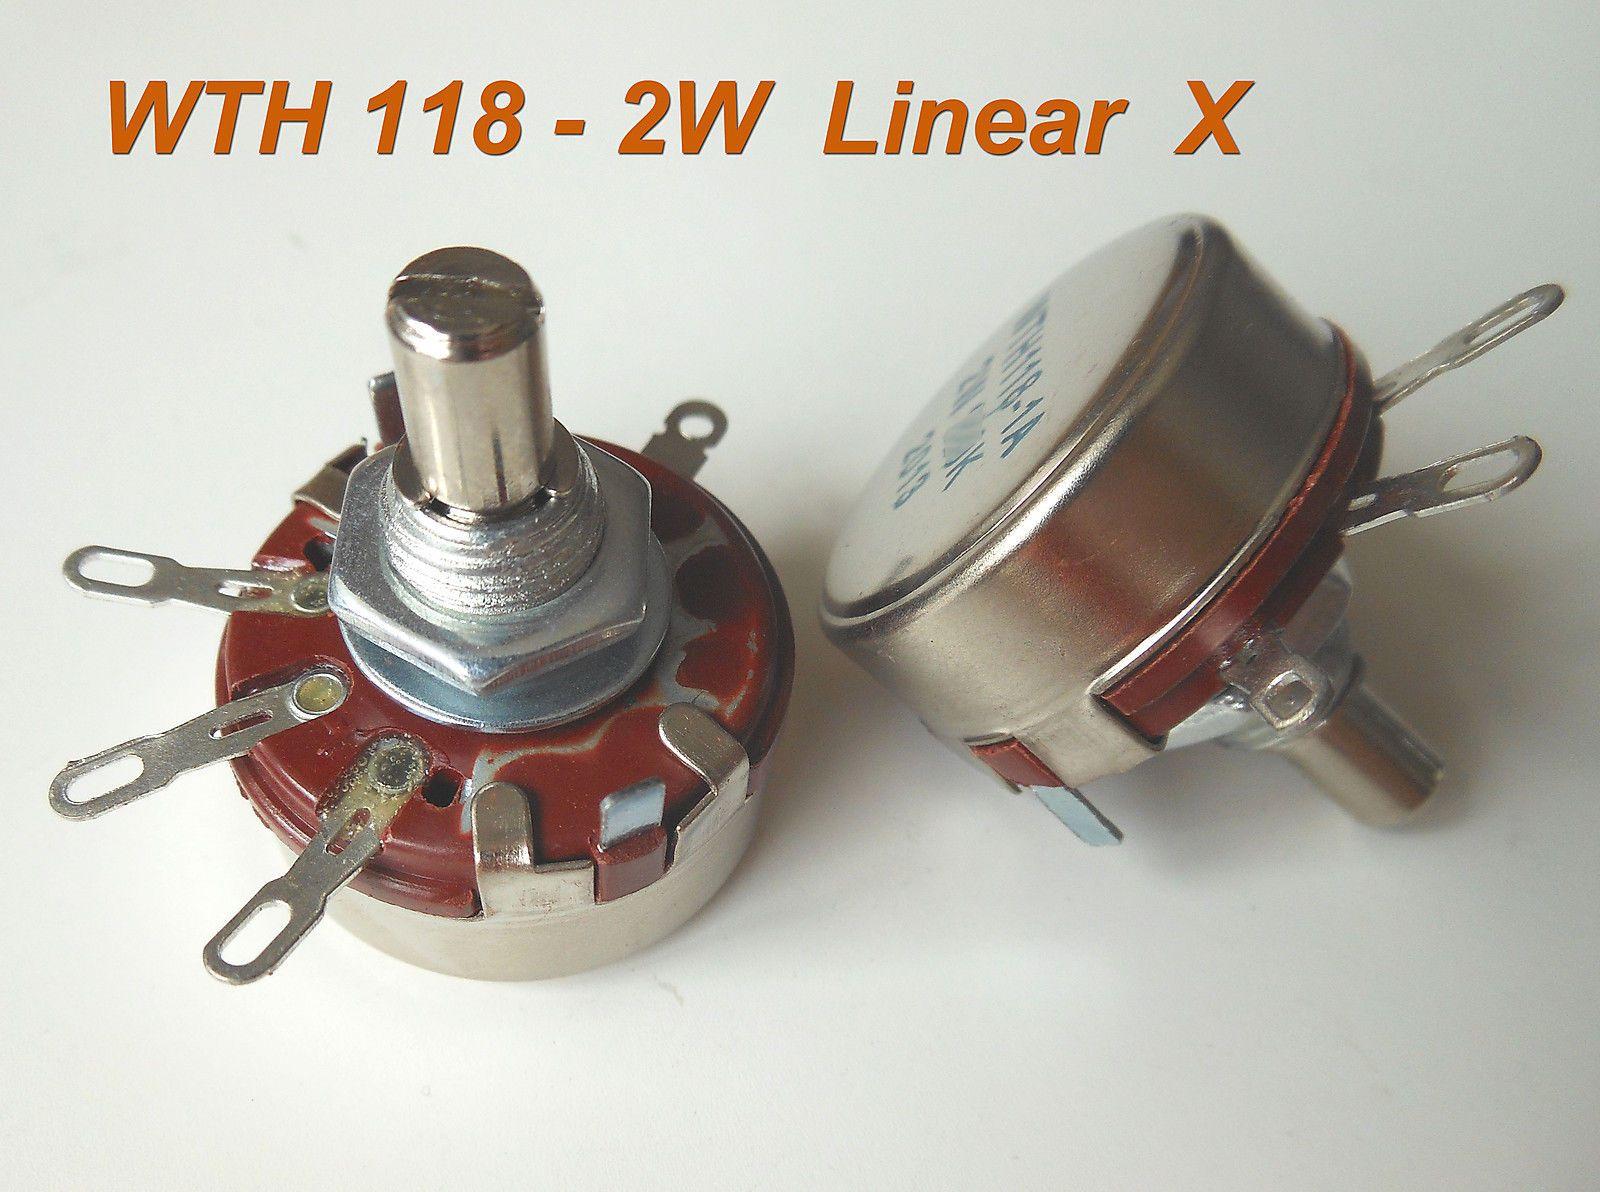 $10 15 - 10Pcs Wth118 Wth118-1A 2W Linear Potentiometer 1K 1 5K To